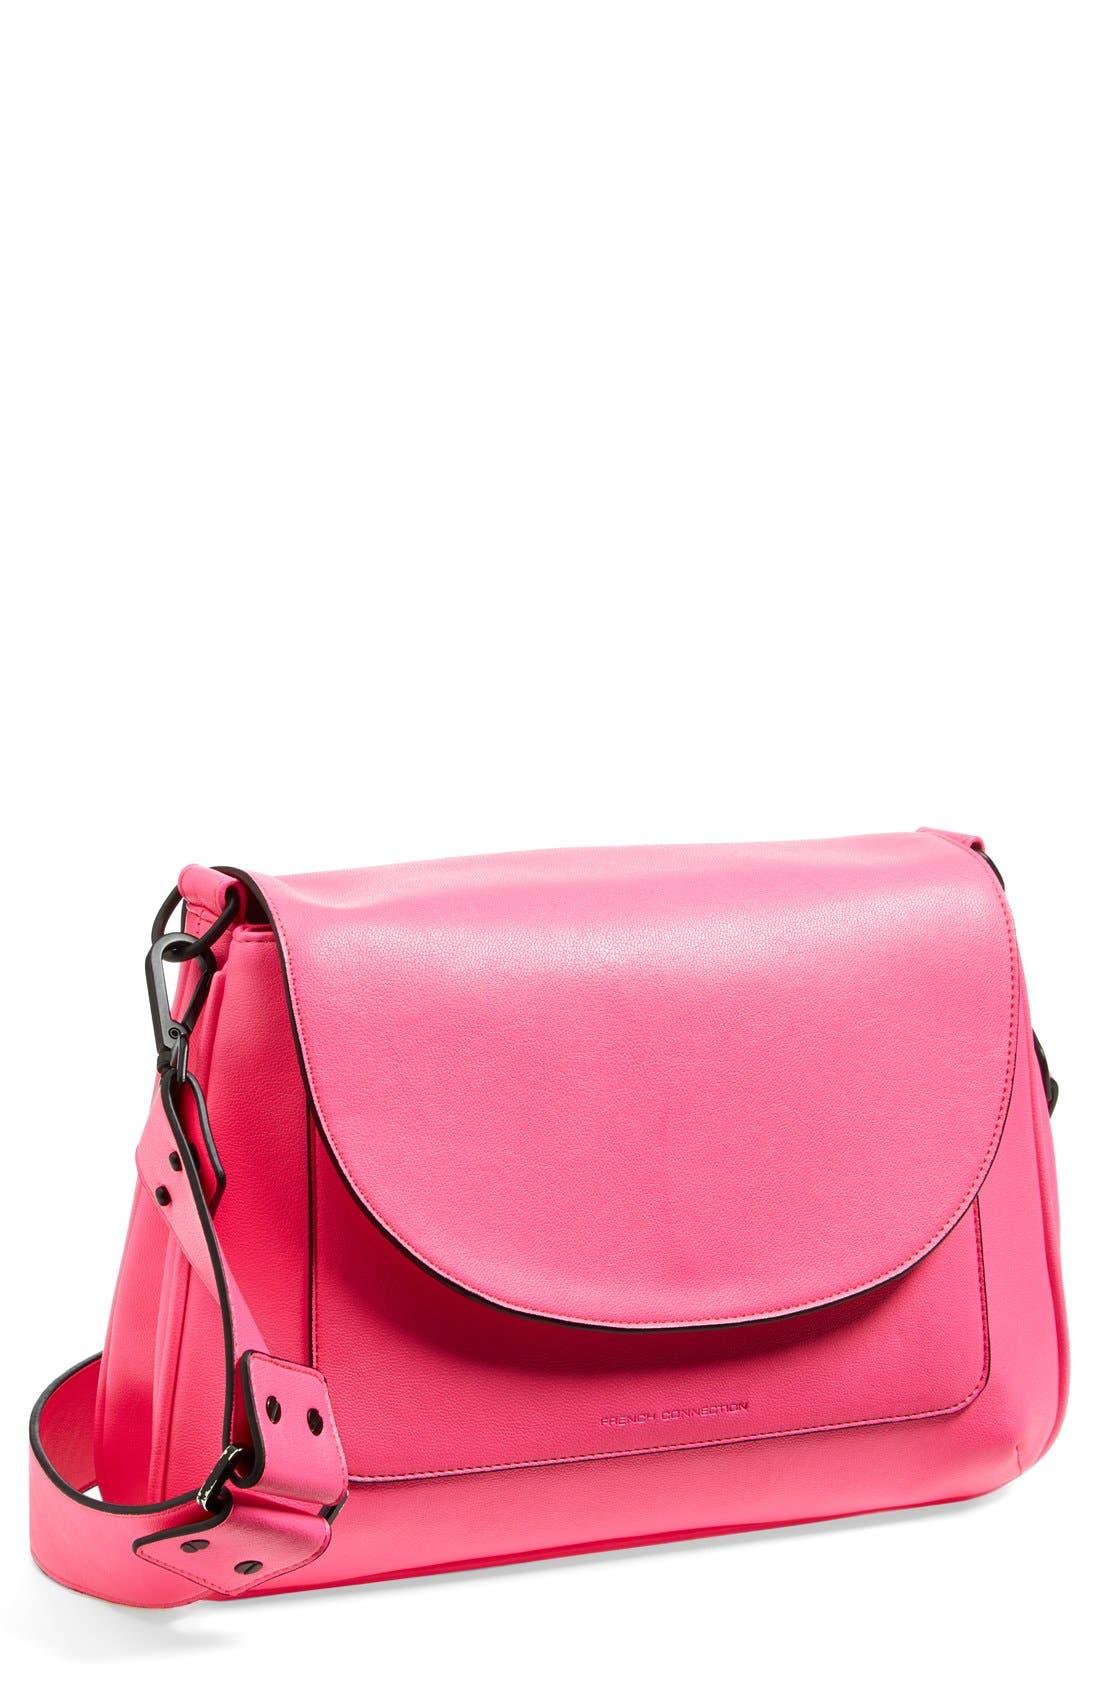 Main Image - French Connection 'Mod Squad' Faux Leather Shoulder Bag